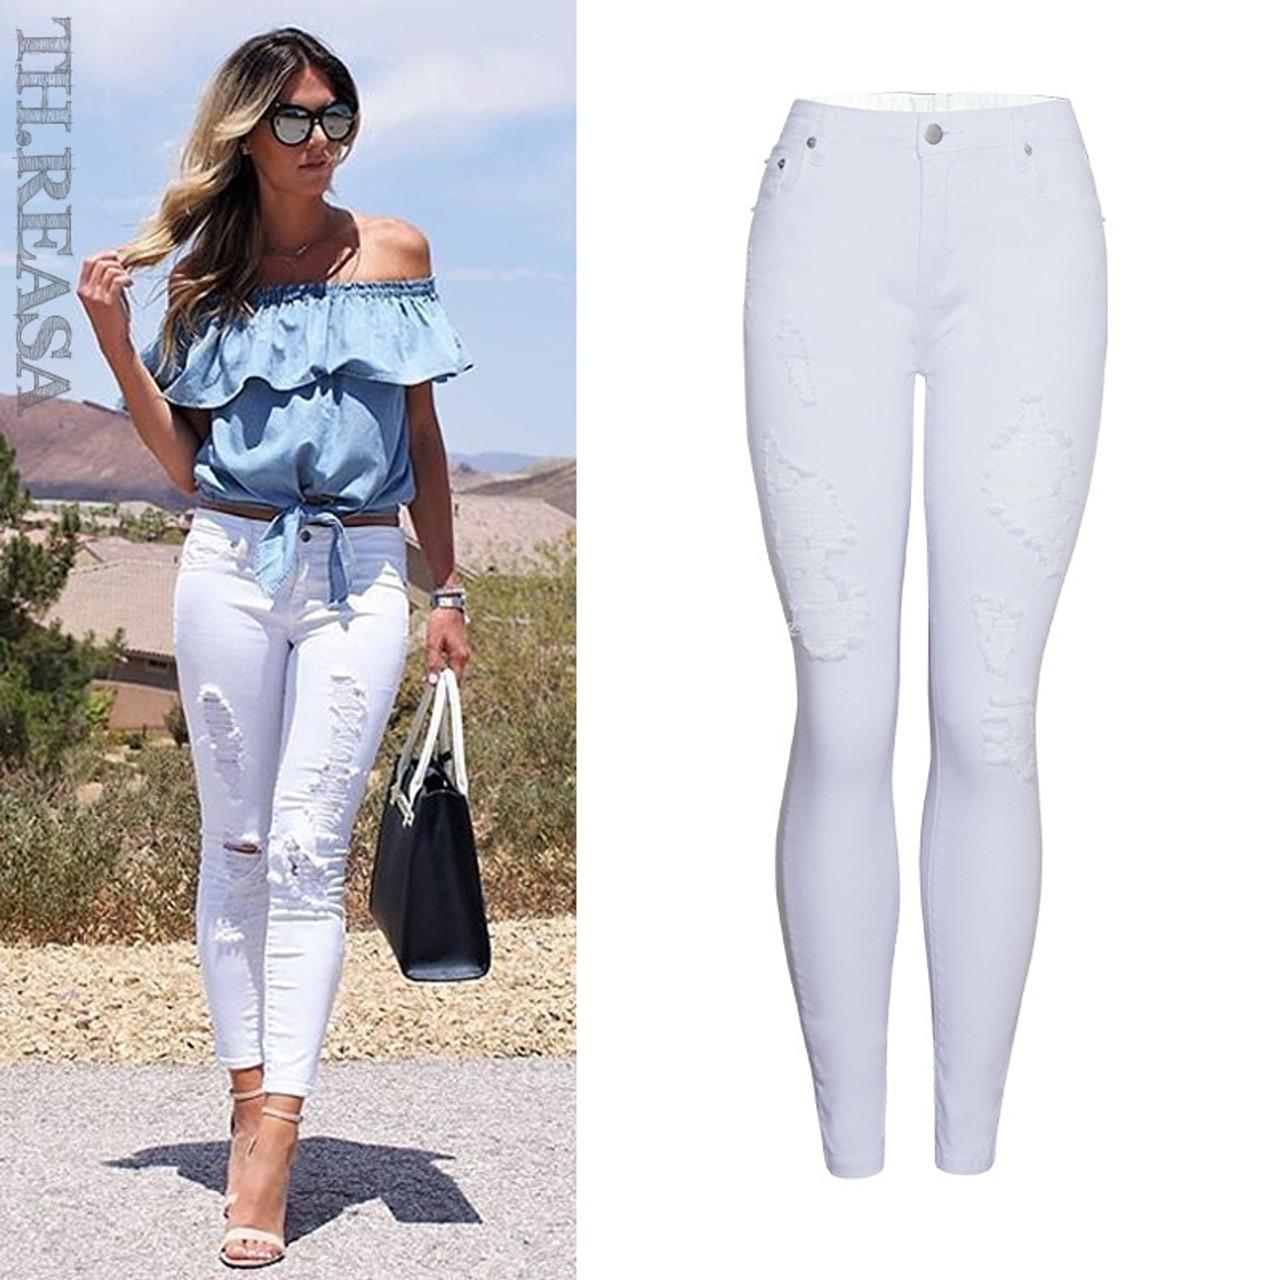 28c8542fe ... Summer Style White Hole Ripped Jeans Women Jeggings Cool Denim High  Waist Pants Capris Female Skinny ...